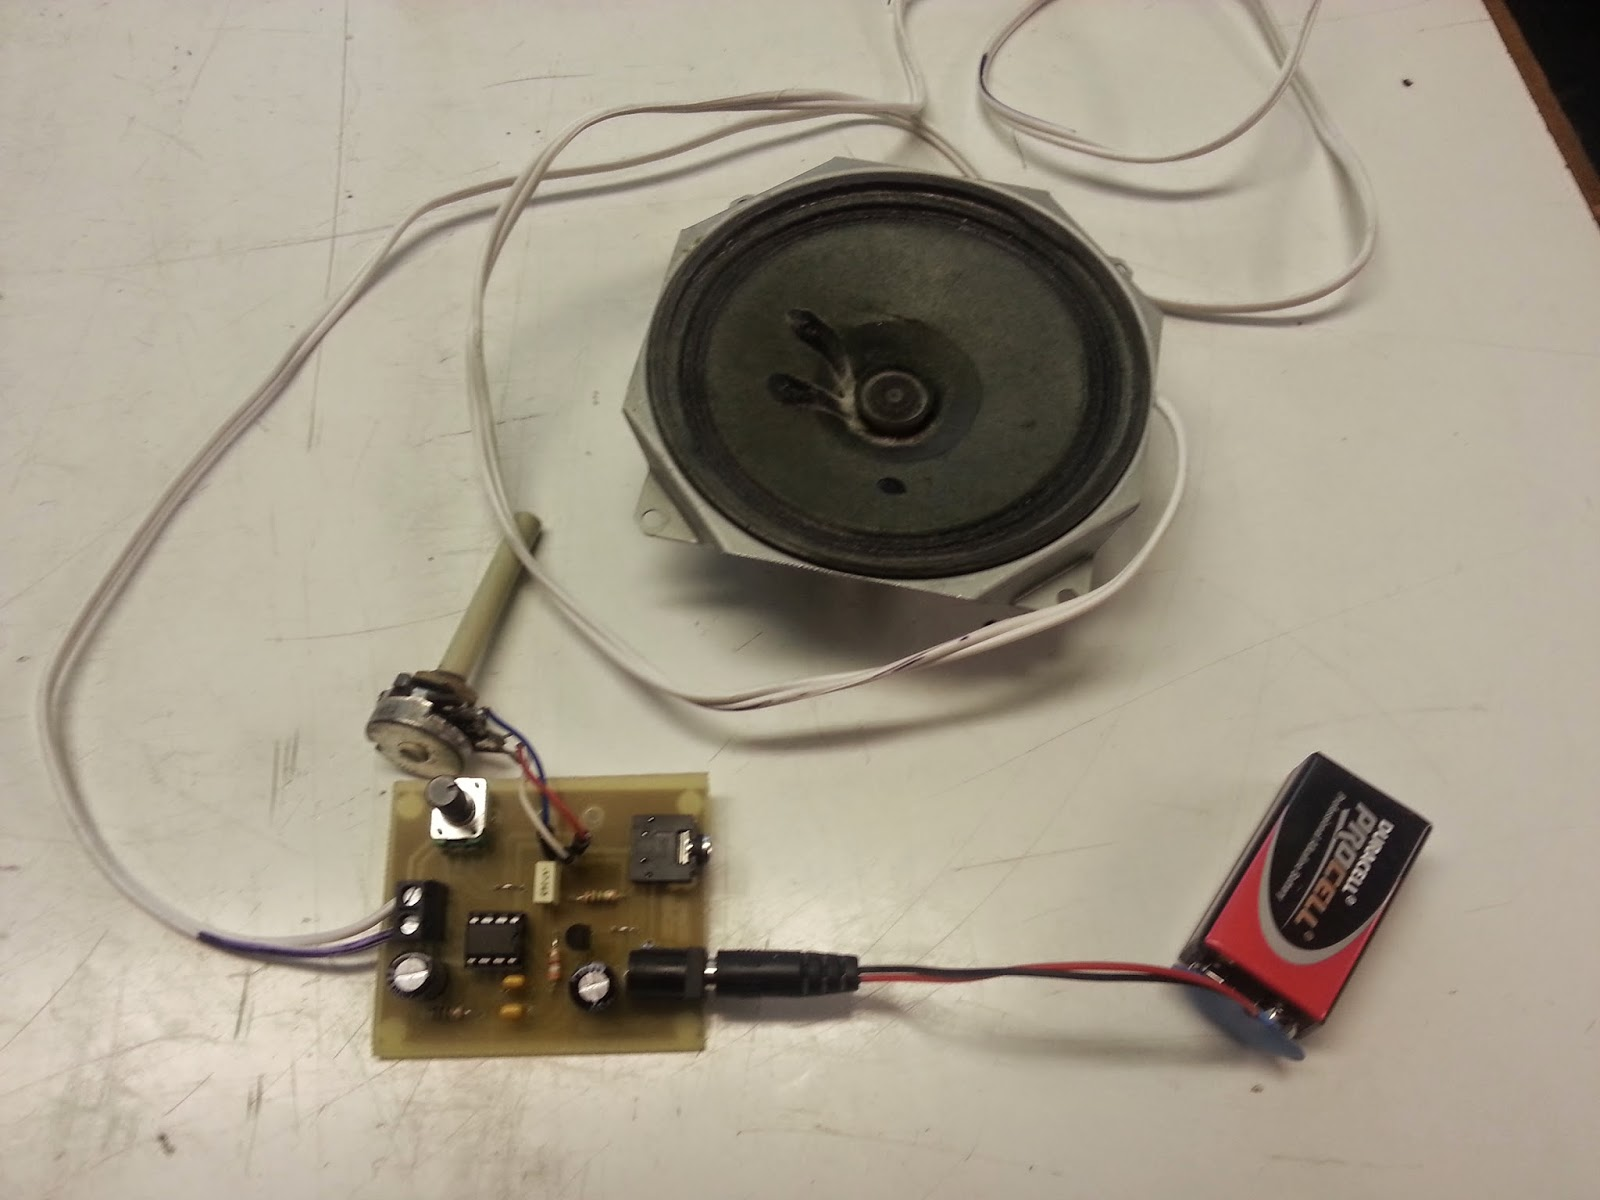 370x250comcastcablemodemdiagram741507jpeg wiring diagram for you 370x250comcastcablemodemdiagram741507jpeg [ 1600 x 1200 Pixel ]